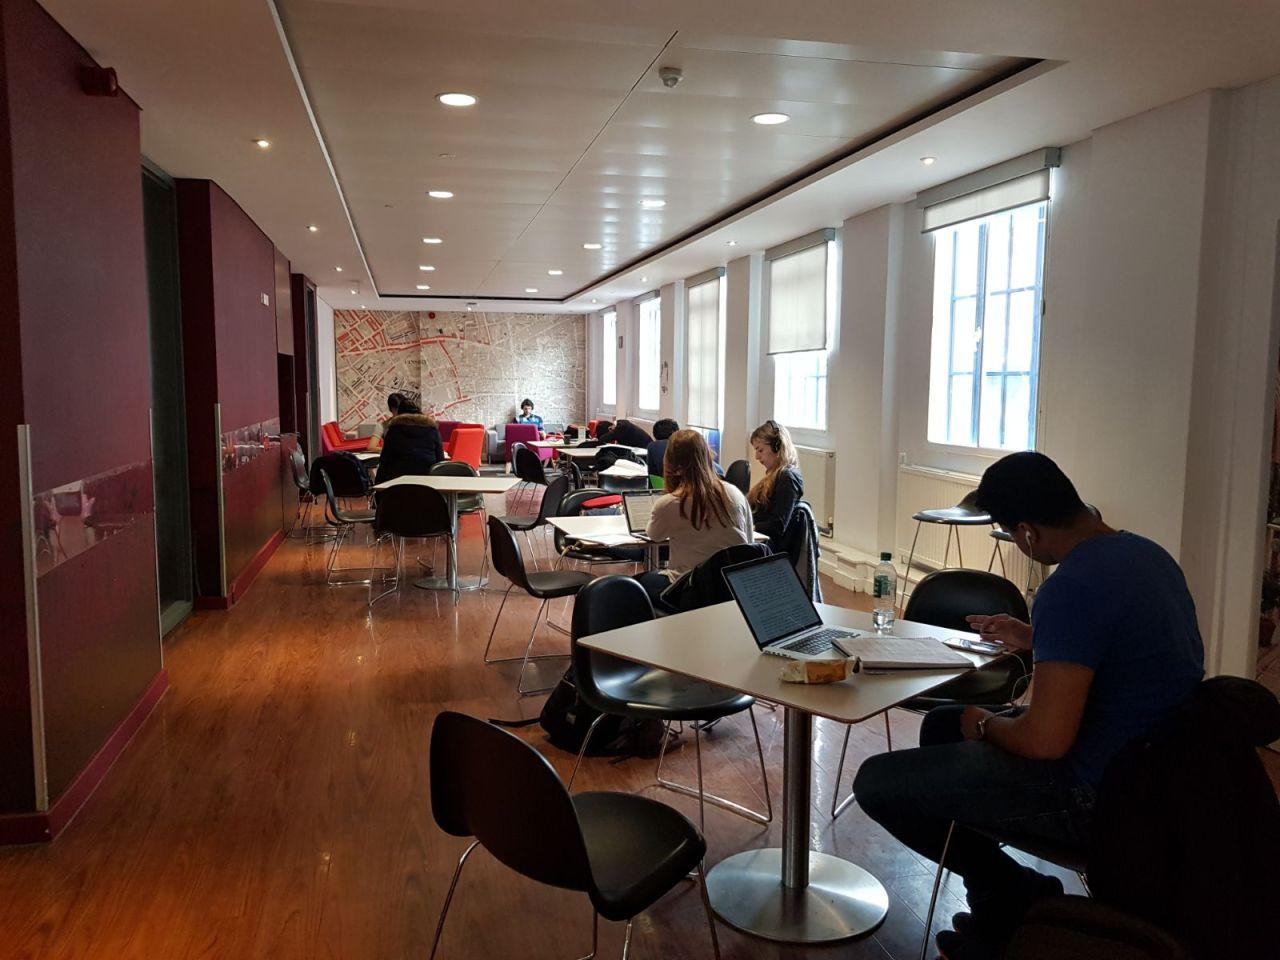 LSE Students' Union — New Undergraduate Common Room